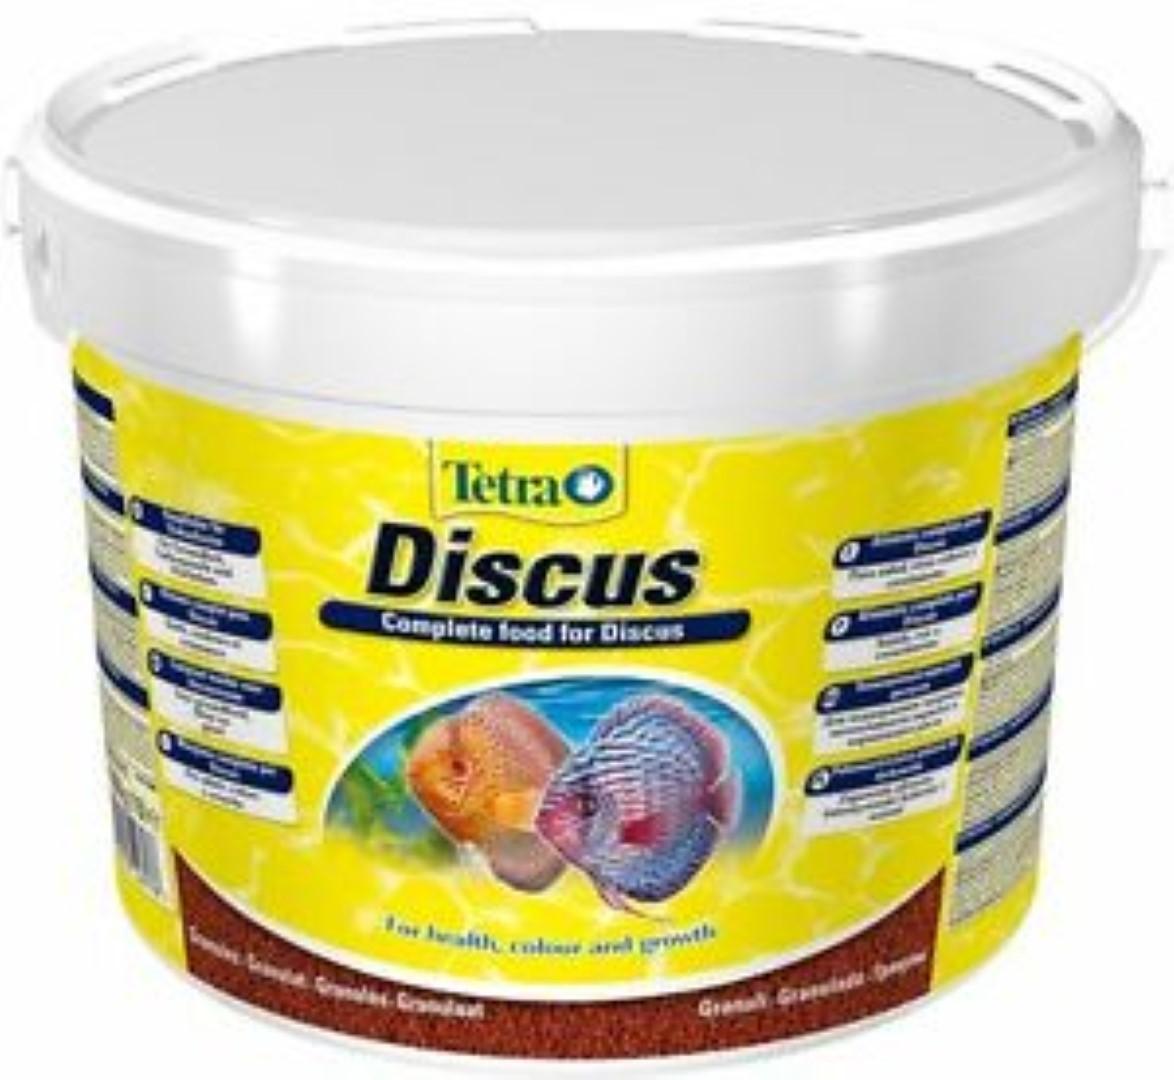 Tetra Discus 10 liter emmer